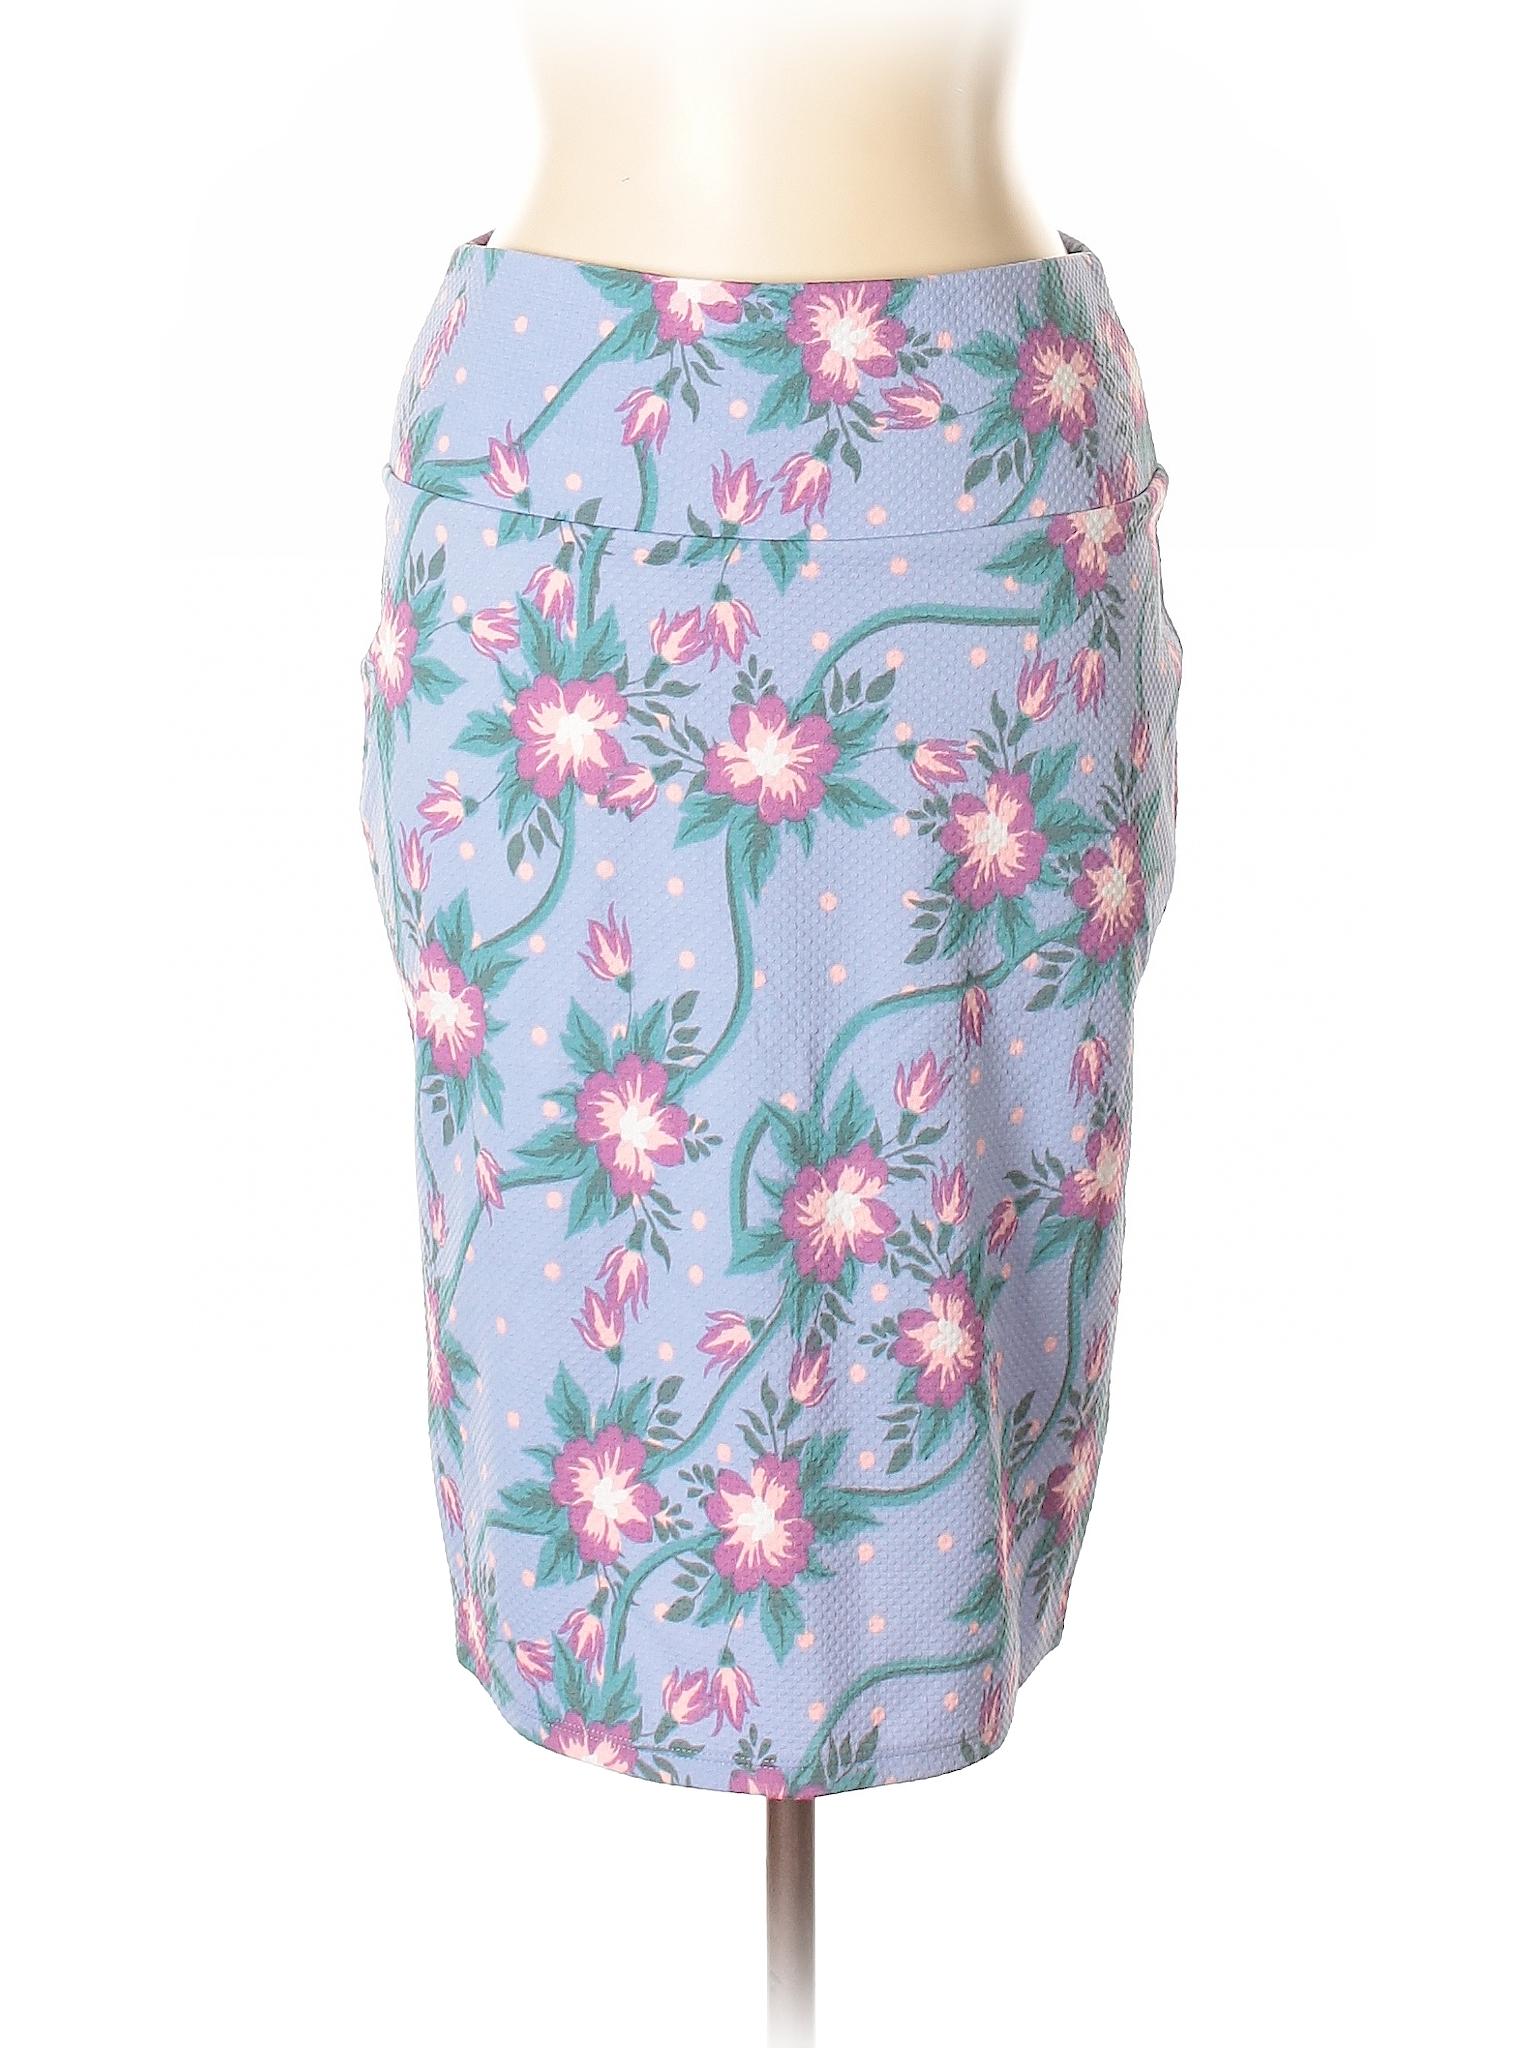 Lularoe Lularoe Boutique Boutique Casual Boutique Casual Skirt Skirt Casual Lularoe HqOgX